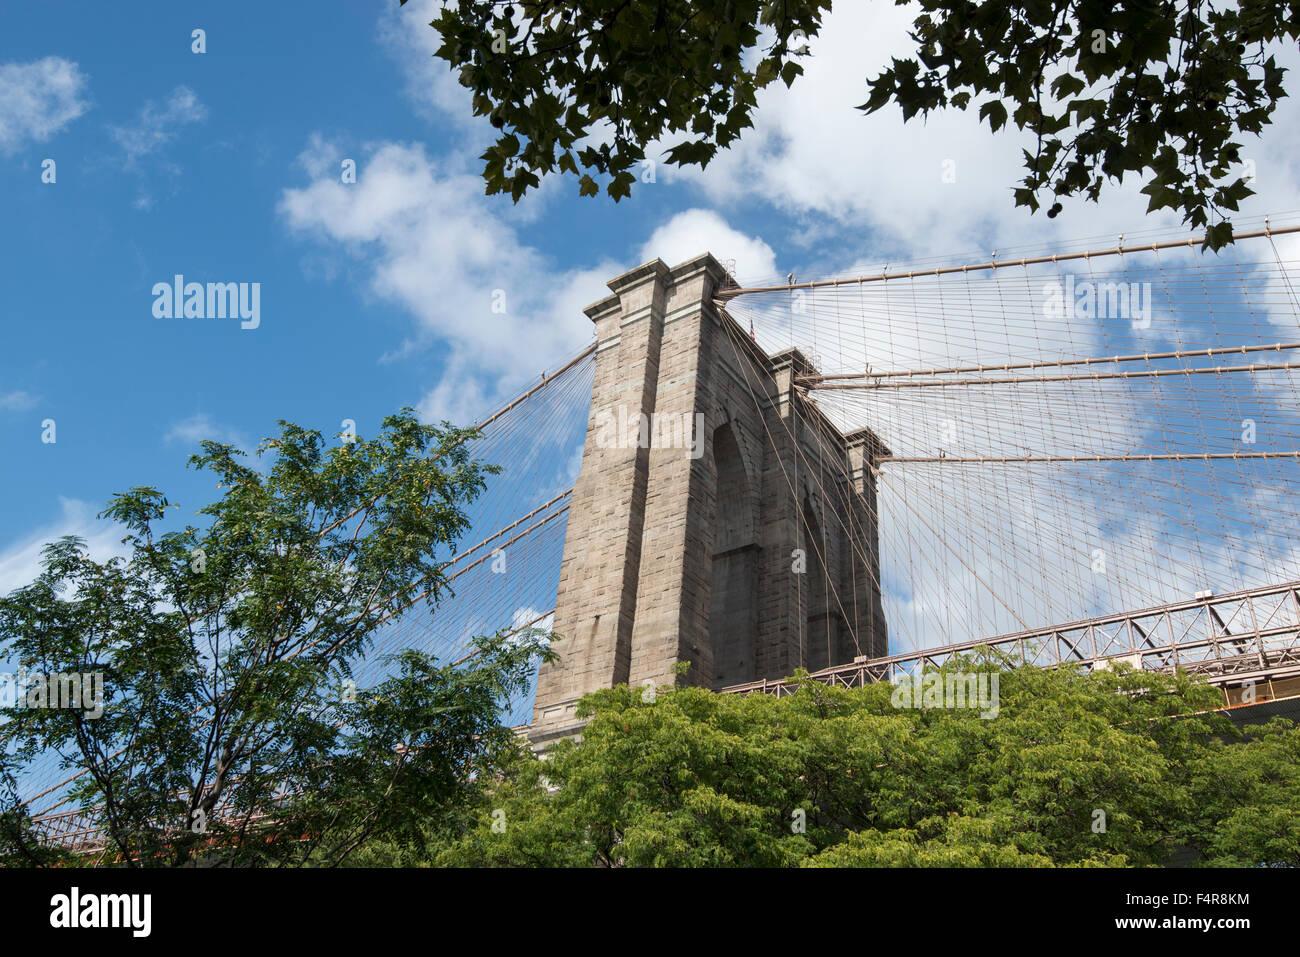 Die Brooklyn Bridge, genommen vom DUMBO Park in Brooklyn, New York USA Stockbild